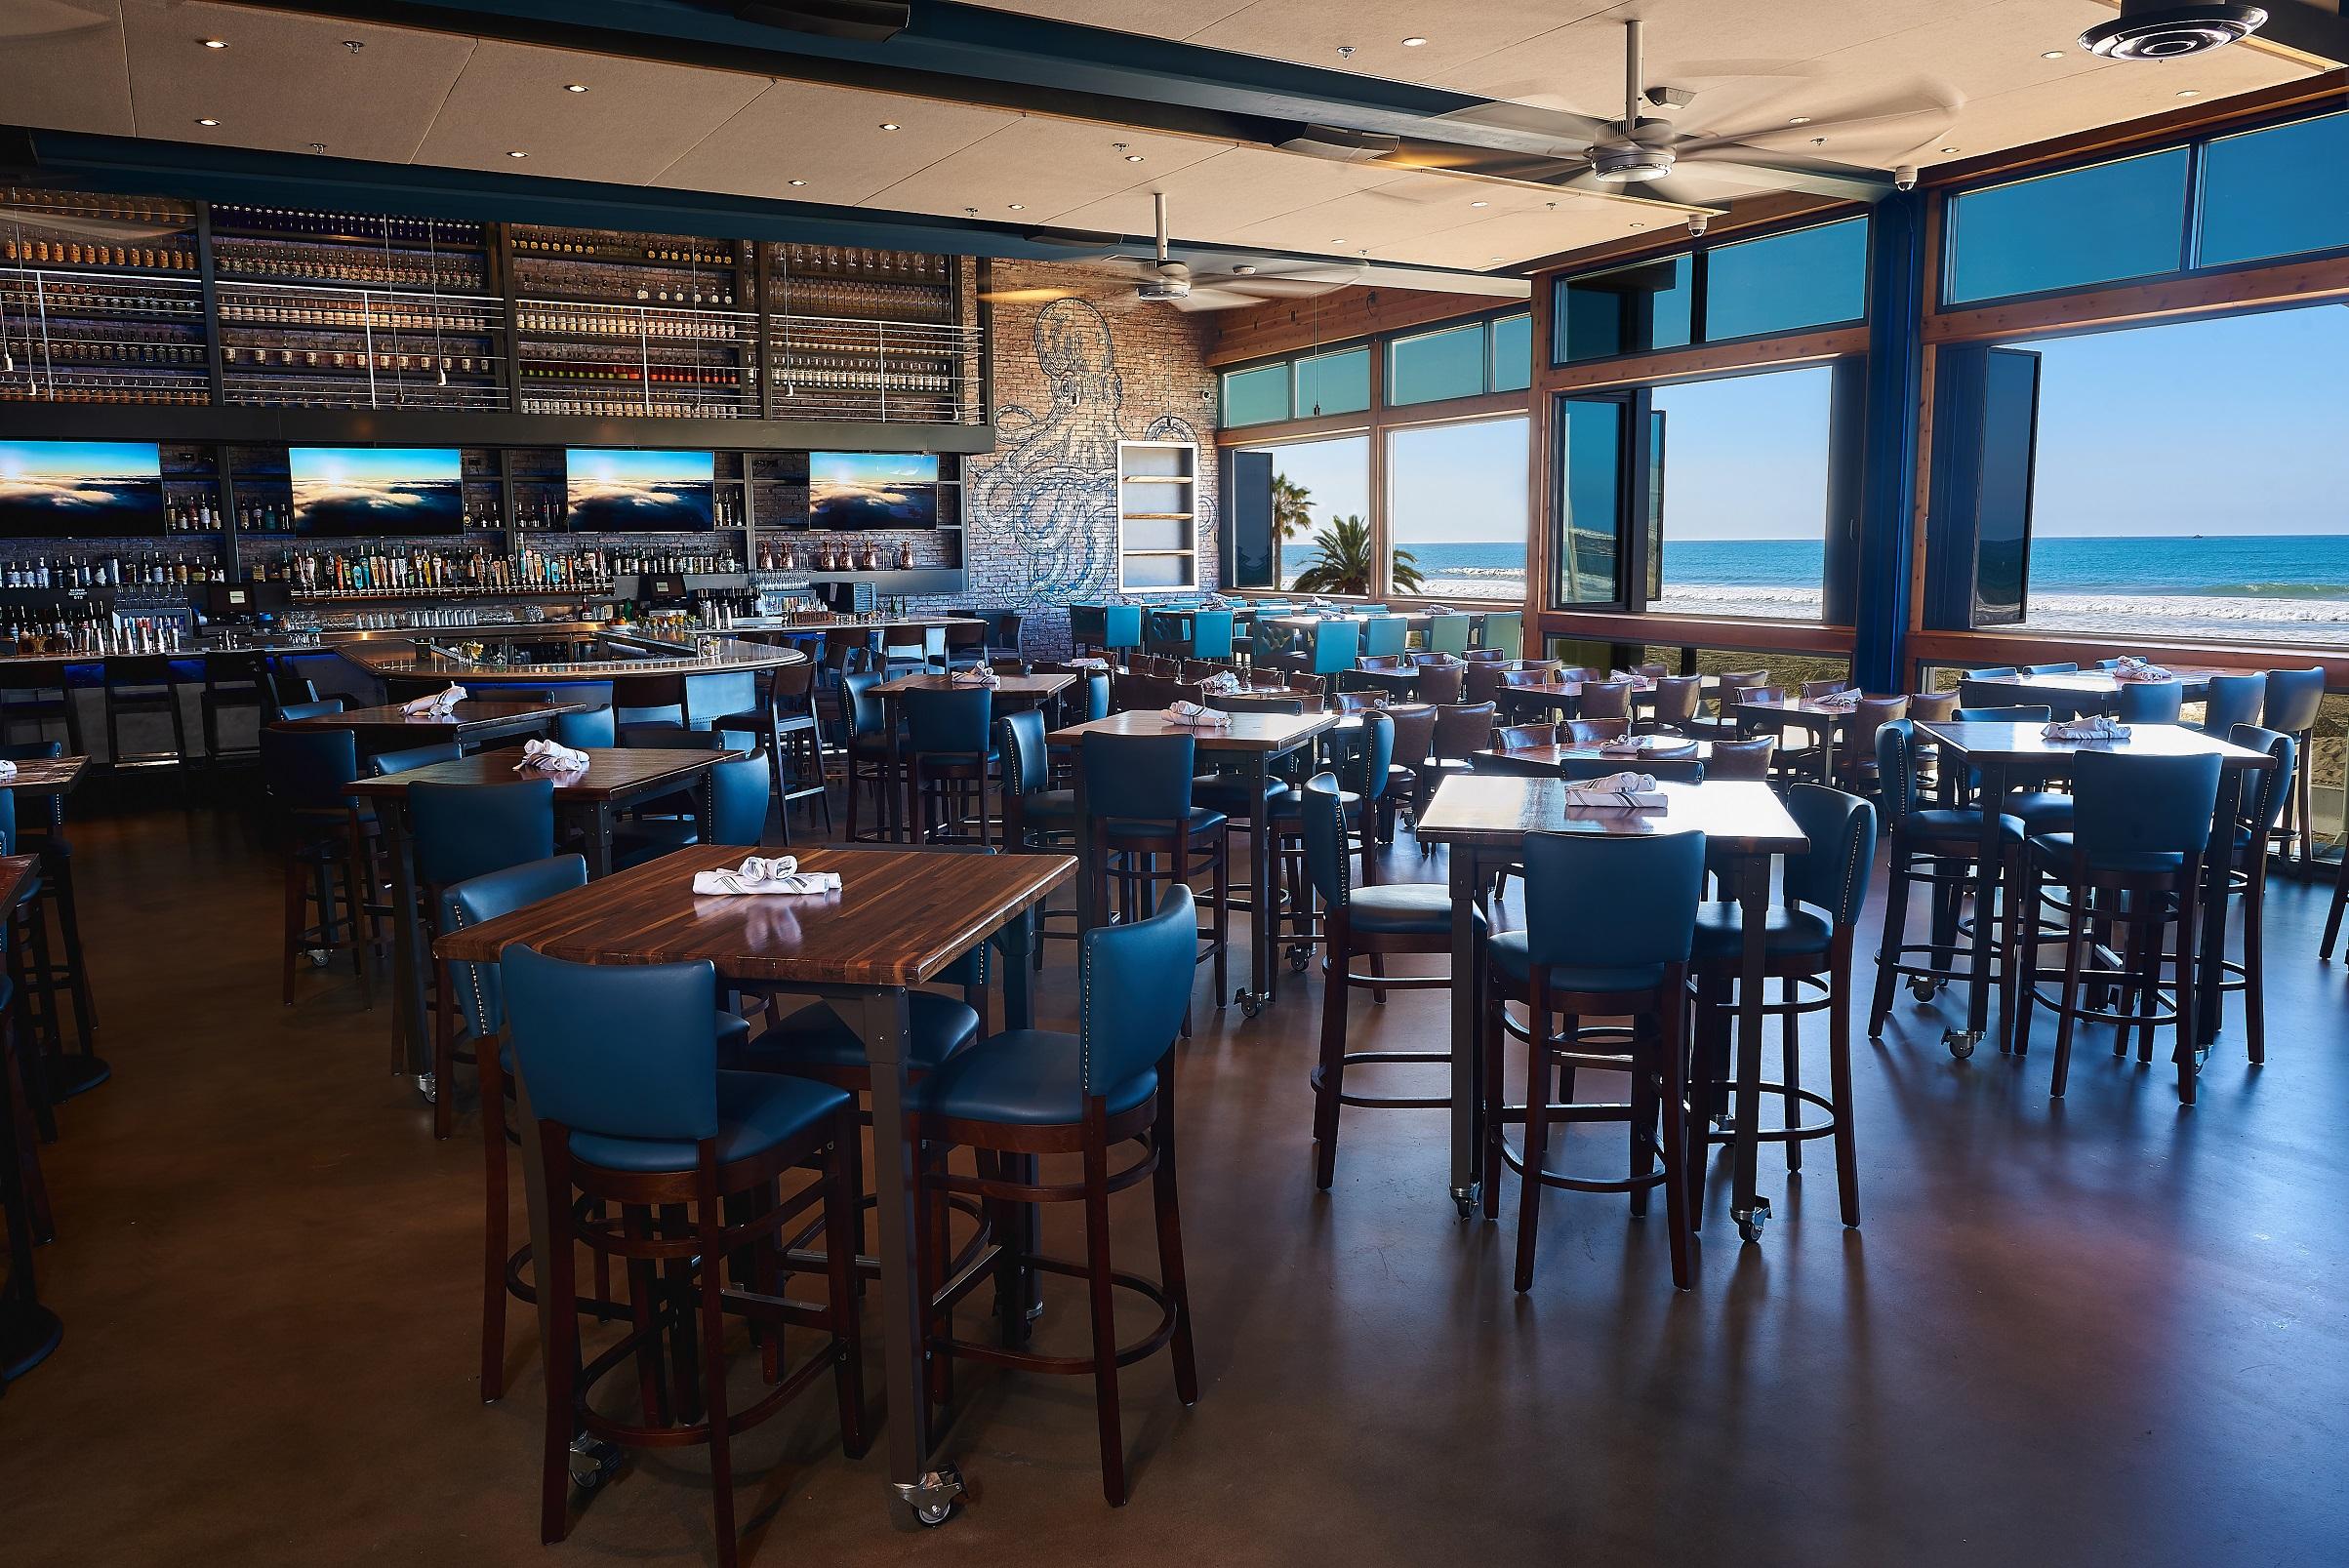 Waterbar Restaurant Opens in Pacific Beach  San Diego Business Journal